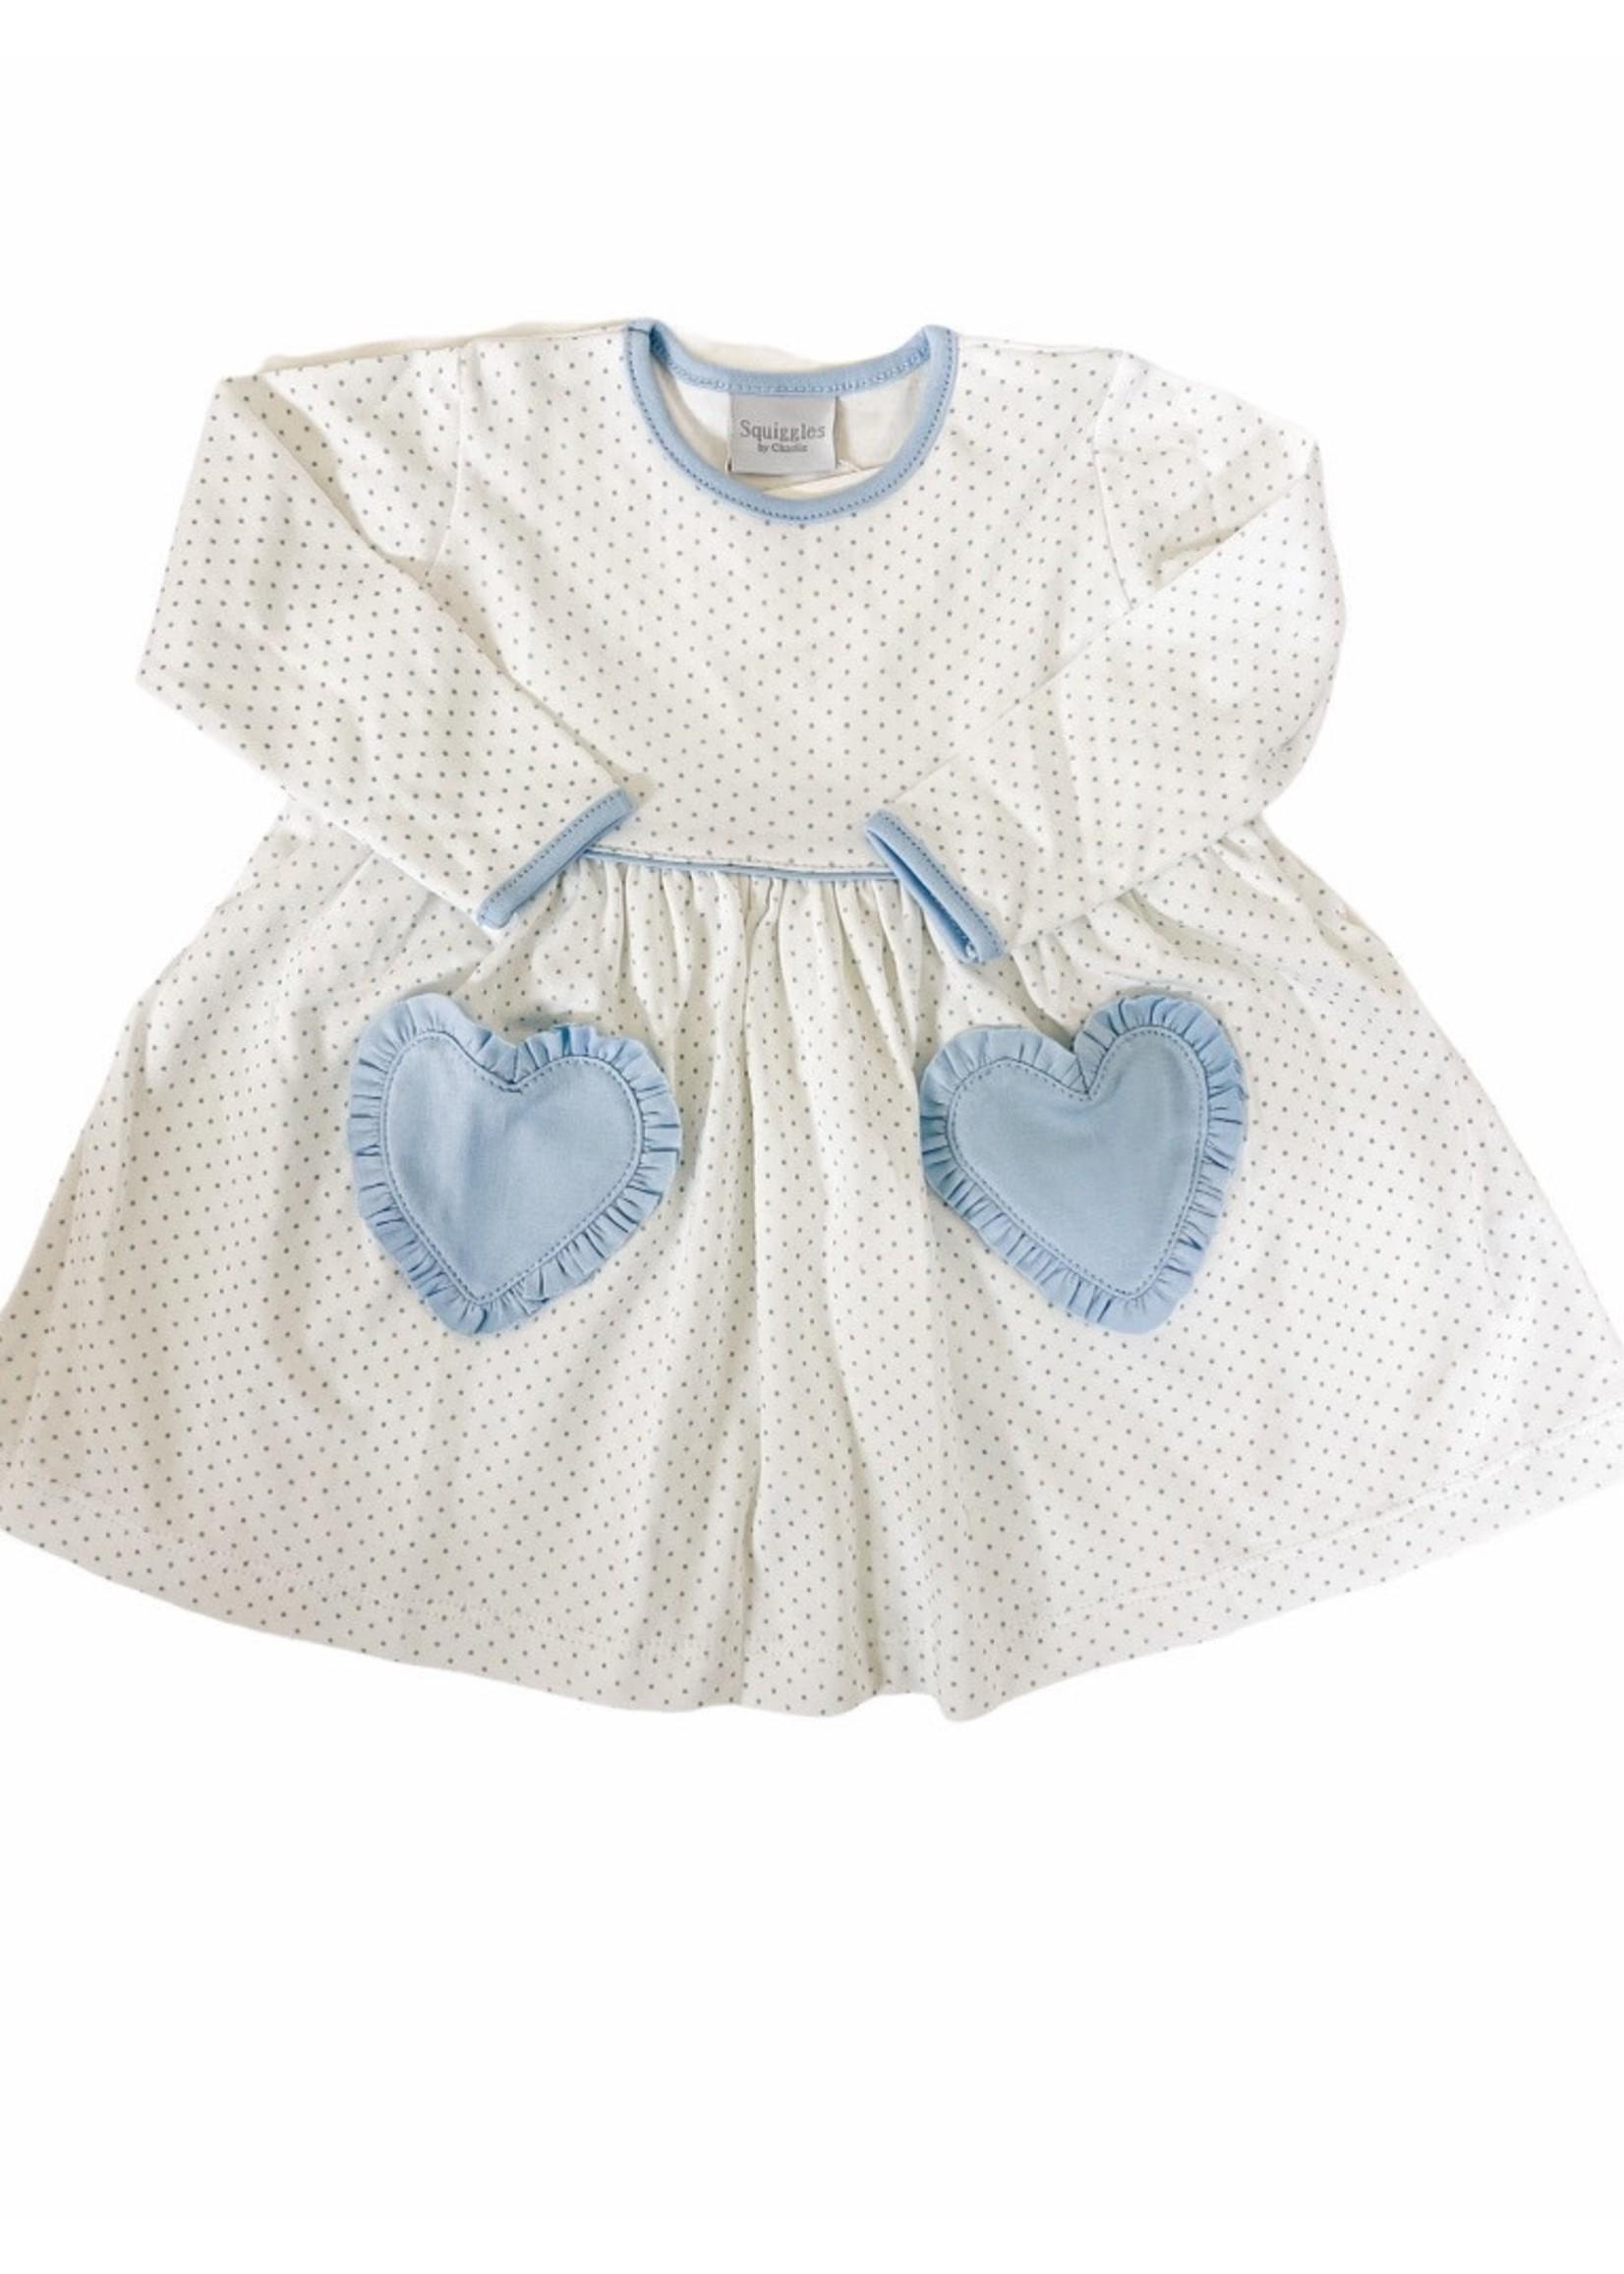 Squiggles Blue Dot Dress w/ Blue Heart Pockets